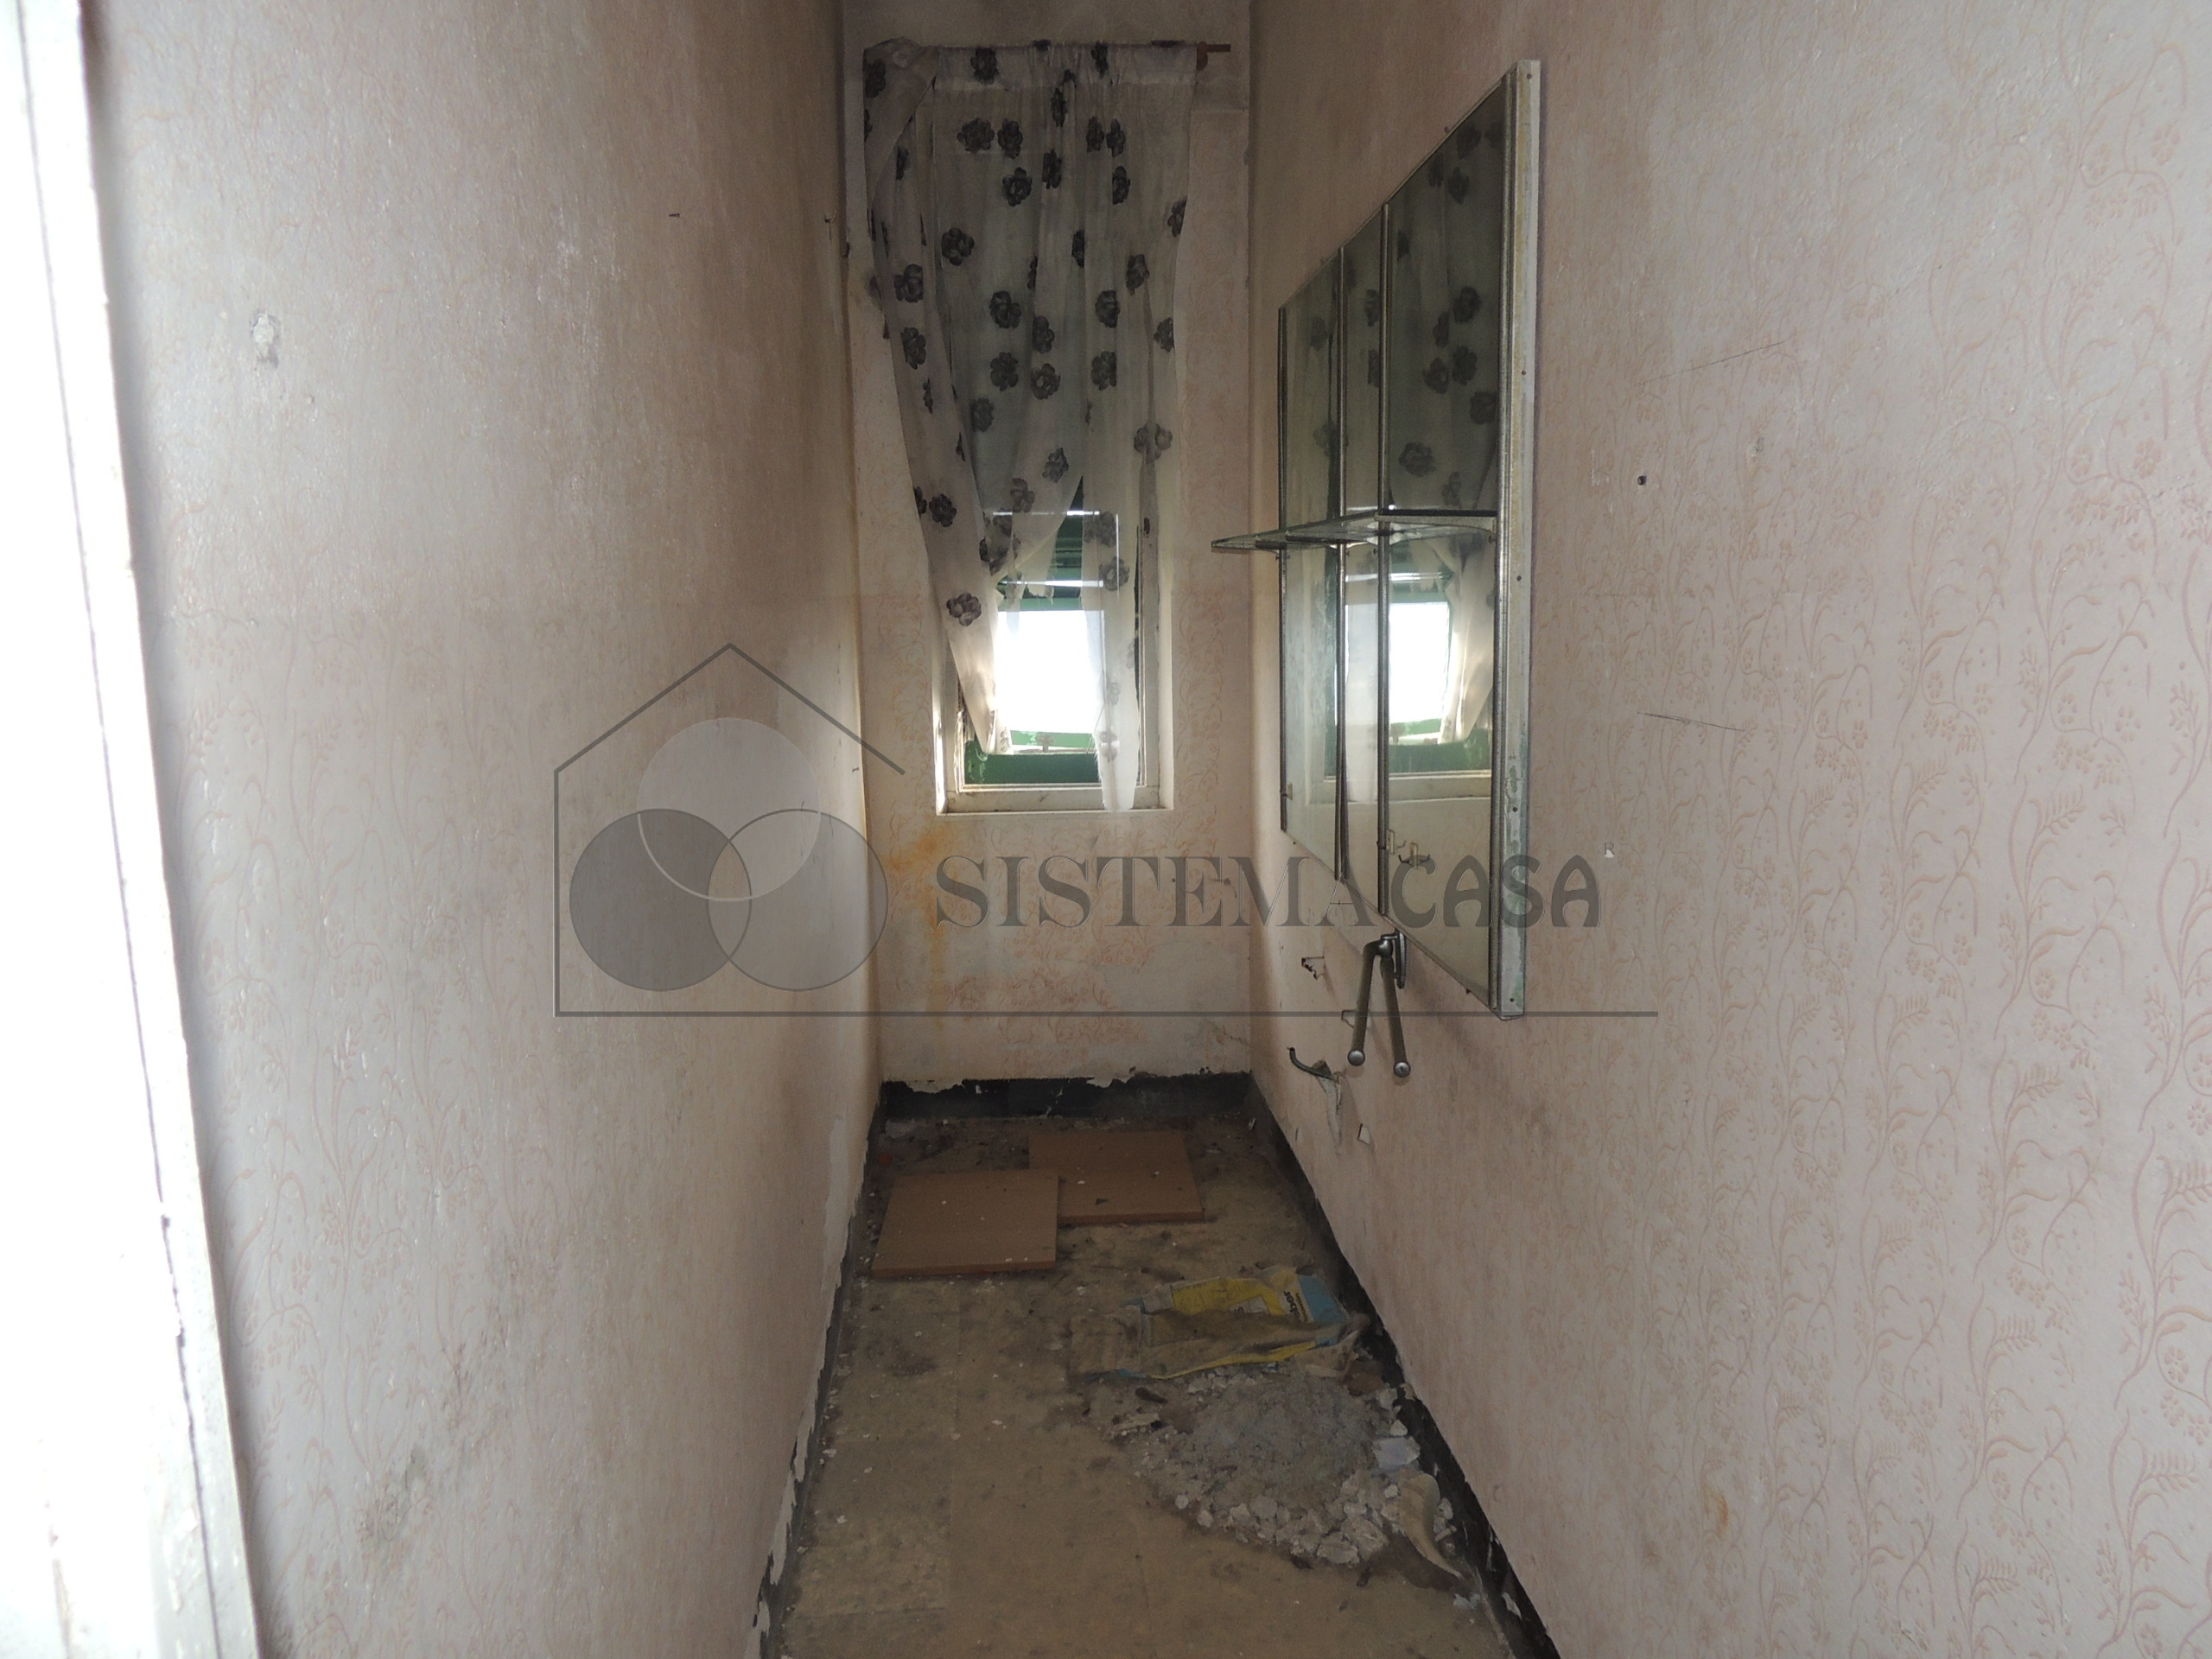 Vendita Casa di Borgo  a Follo, Tivegna (SP) - F142